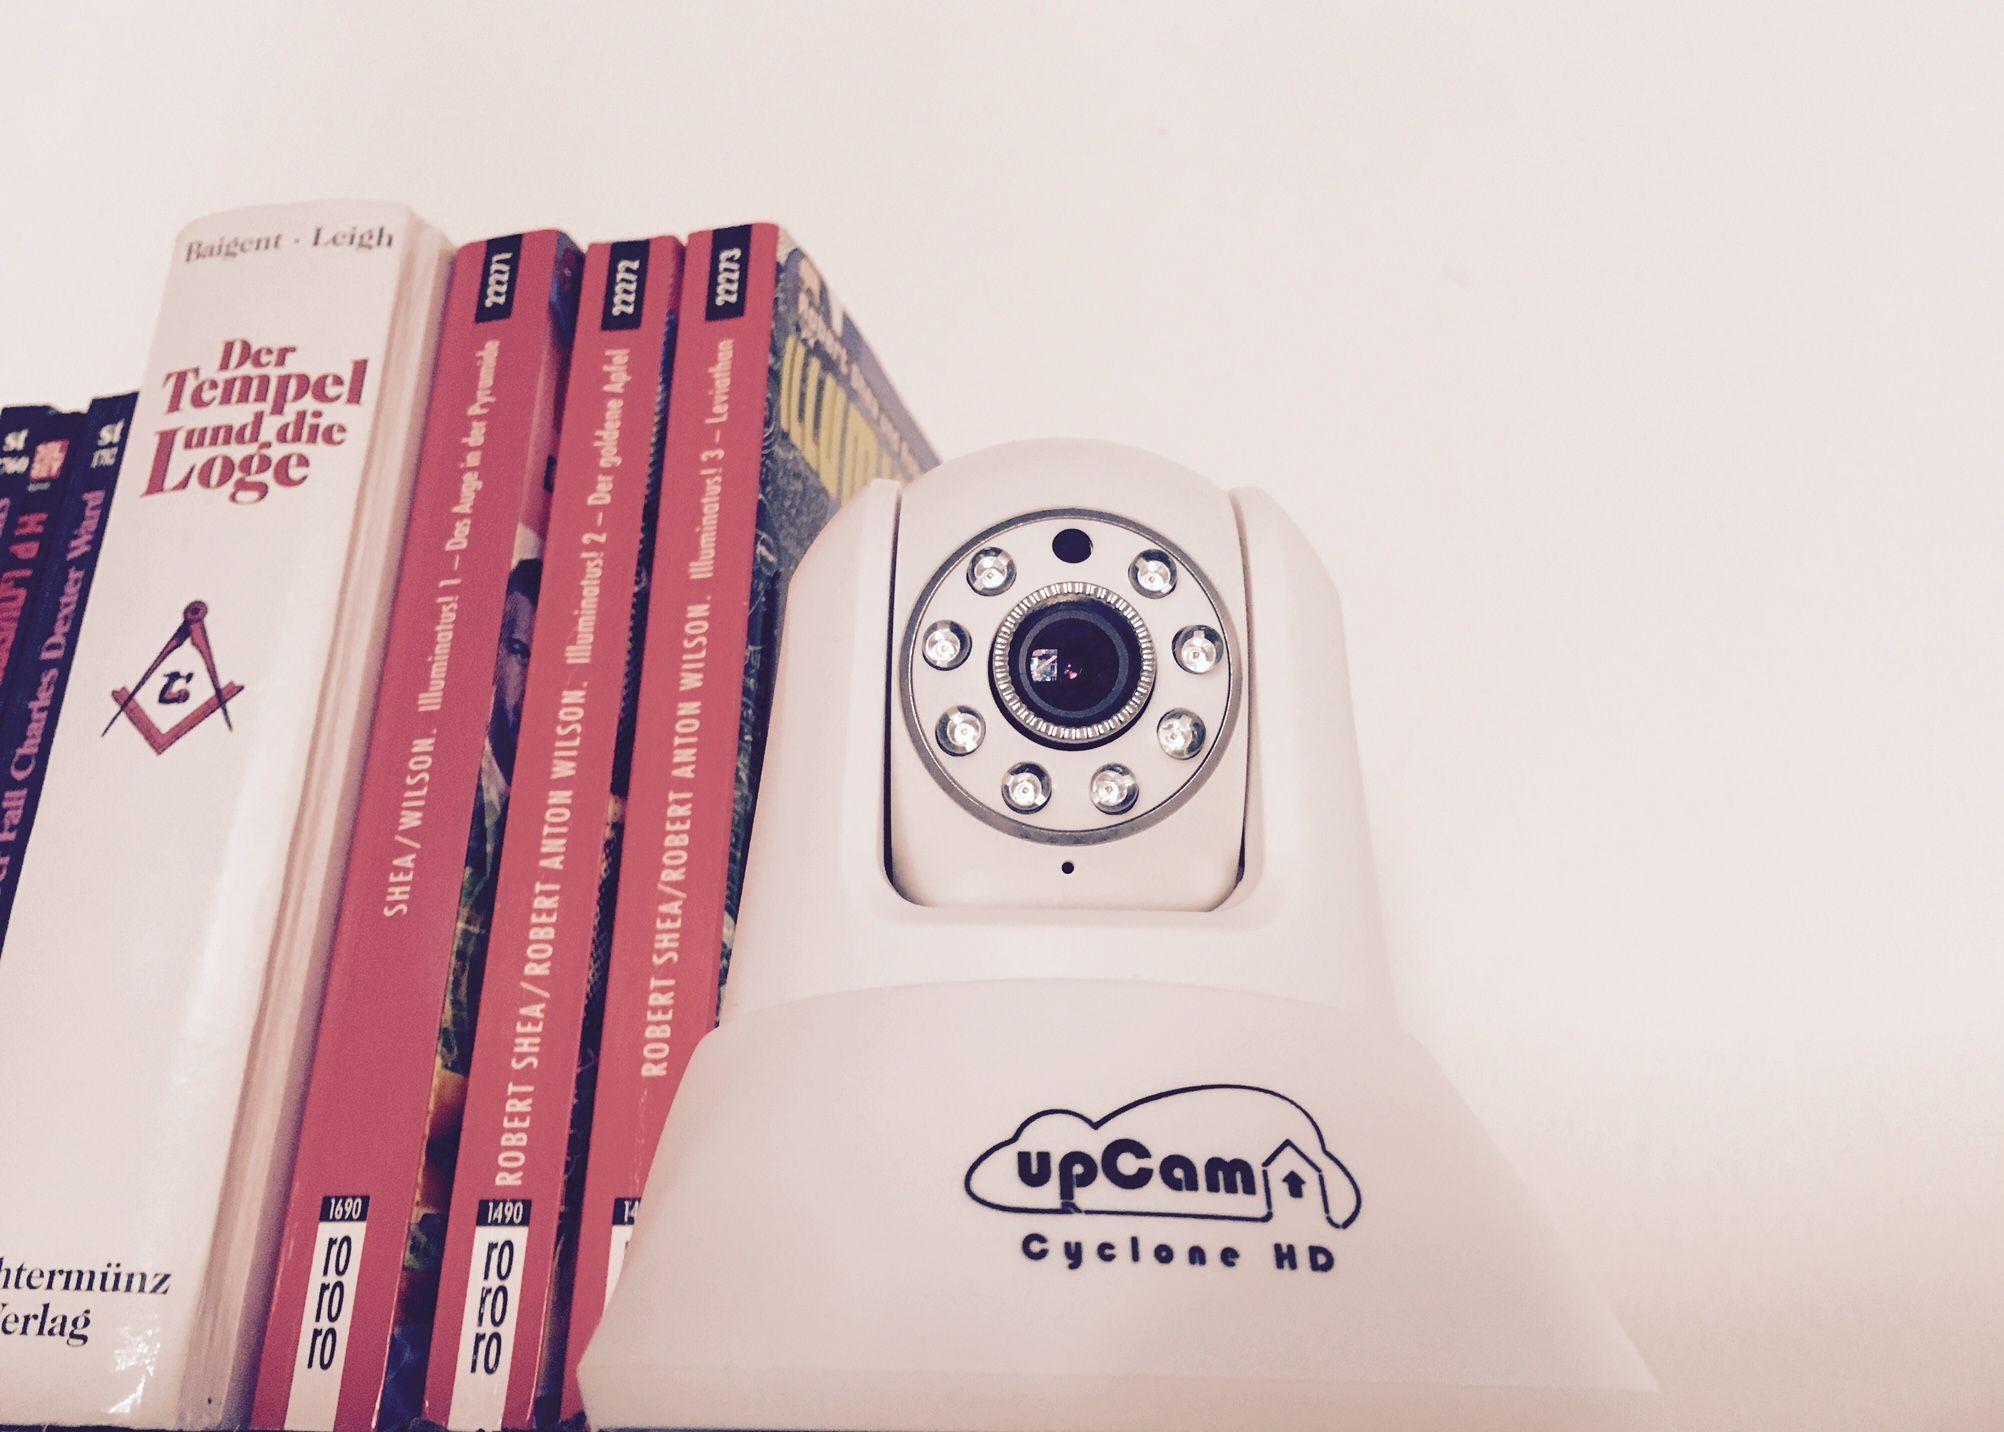 upCam Cyclone HD auf Berlin-Curves.com #upCam #CycloneHD